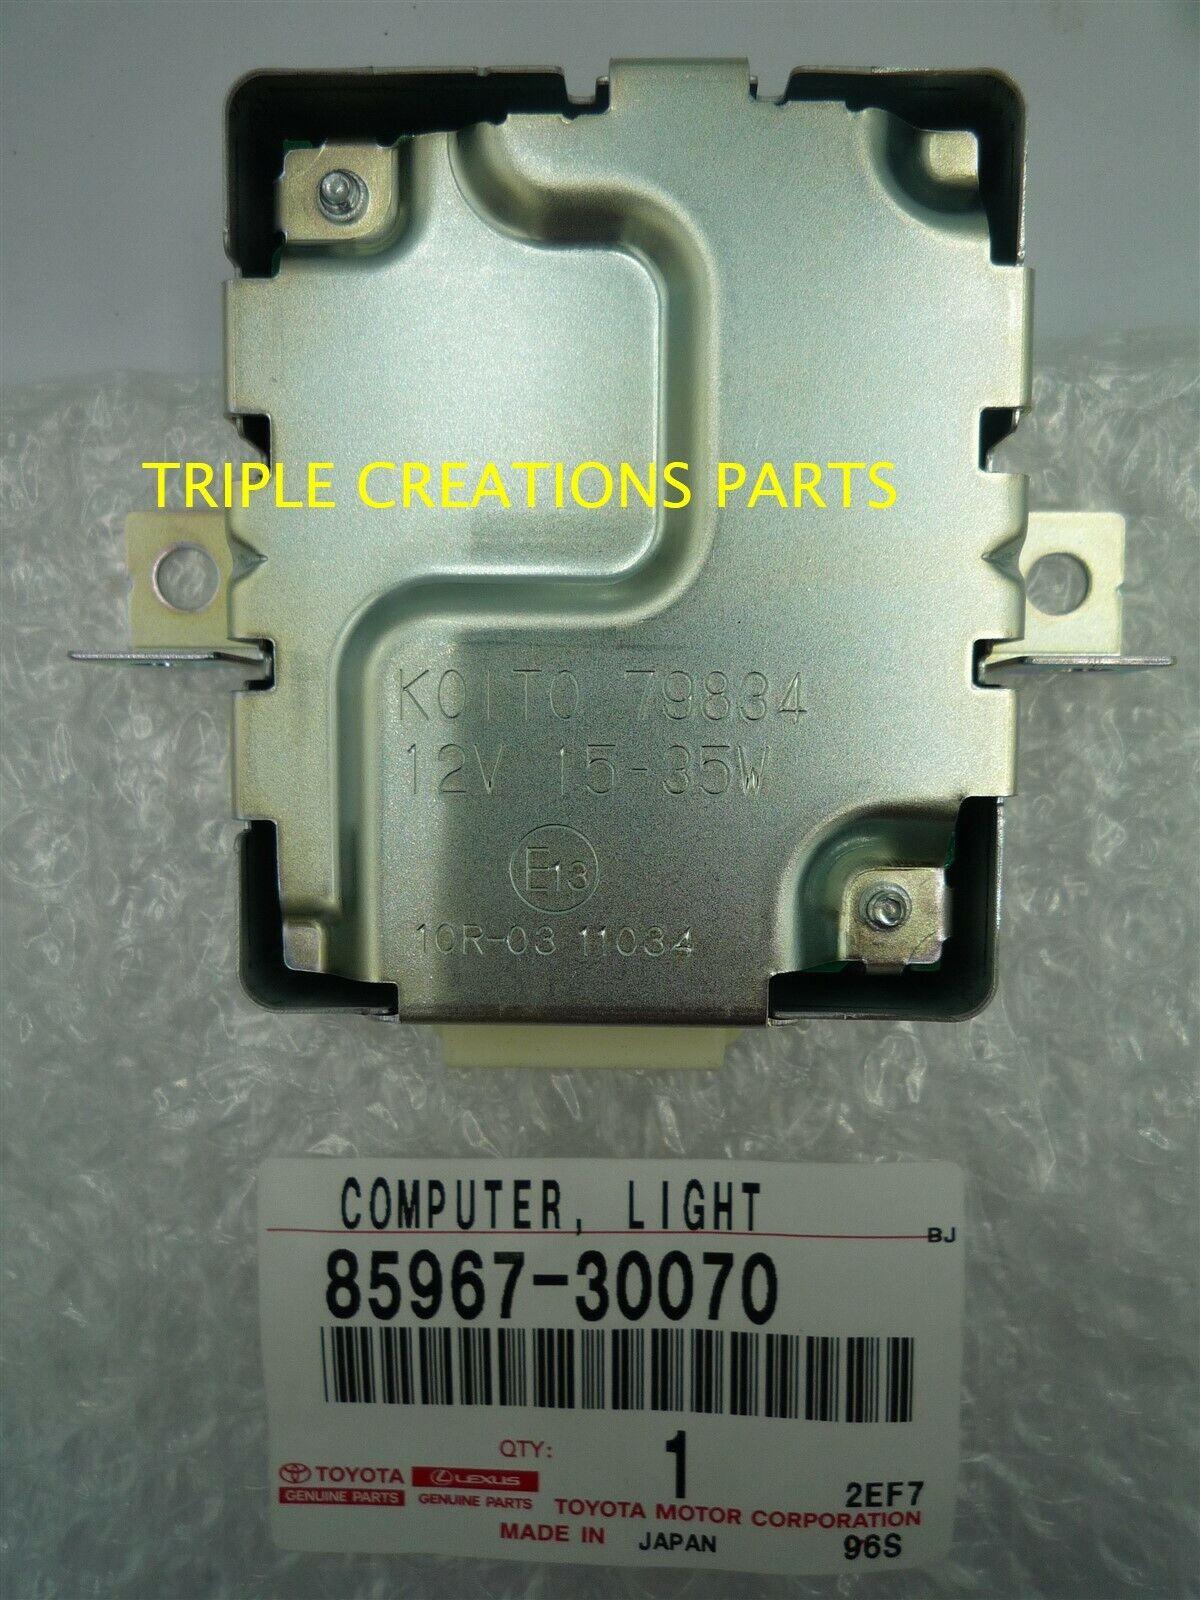 LIGHT CONTROL 85967-30070 8596730070 Genuine Toyota COMPUTER